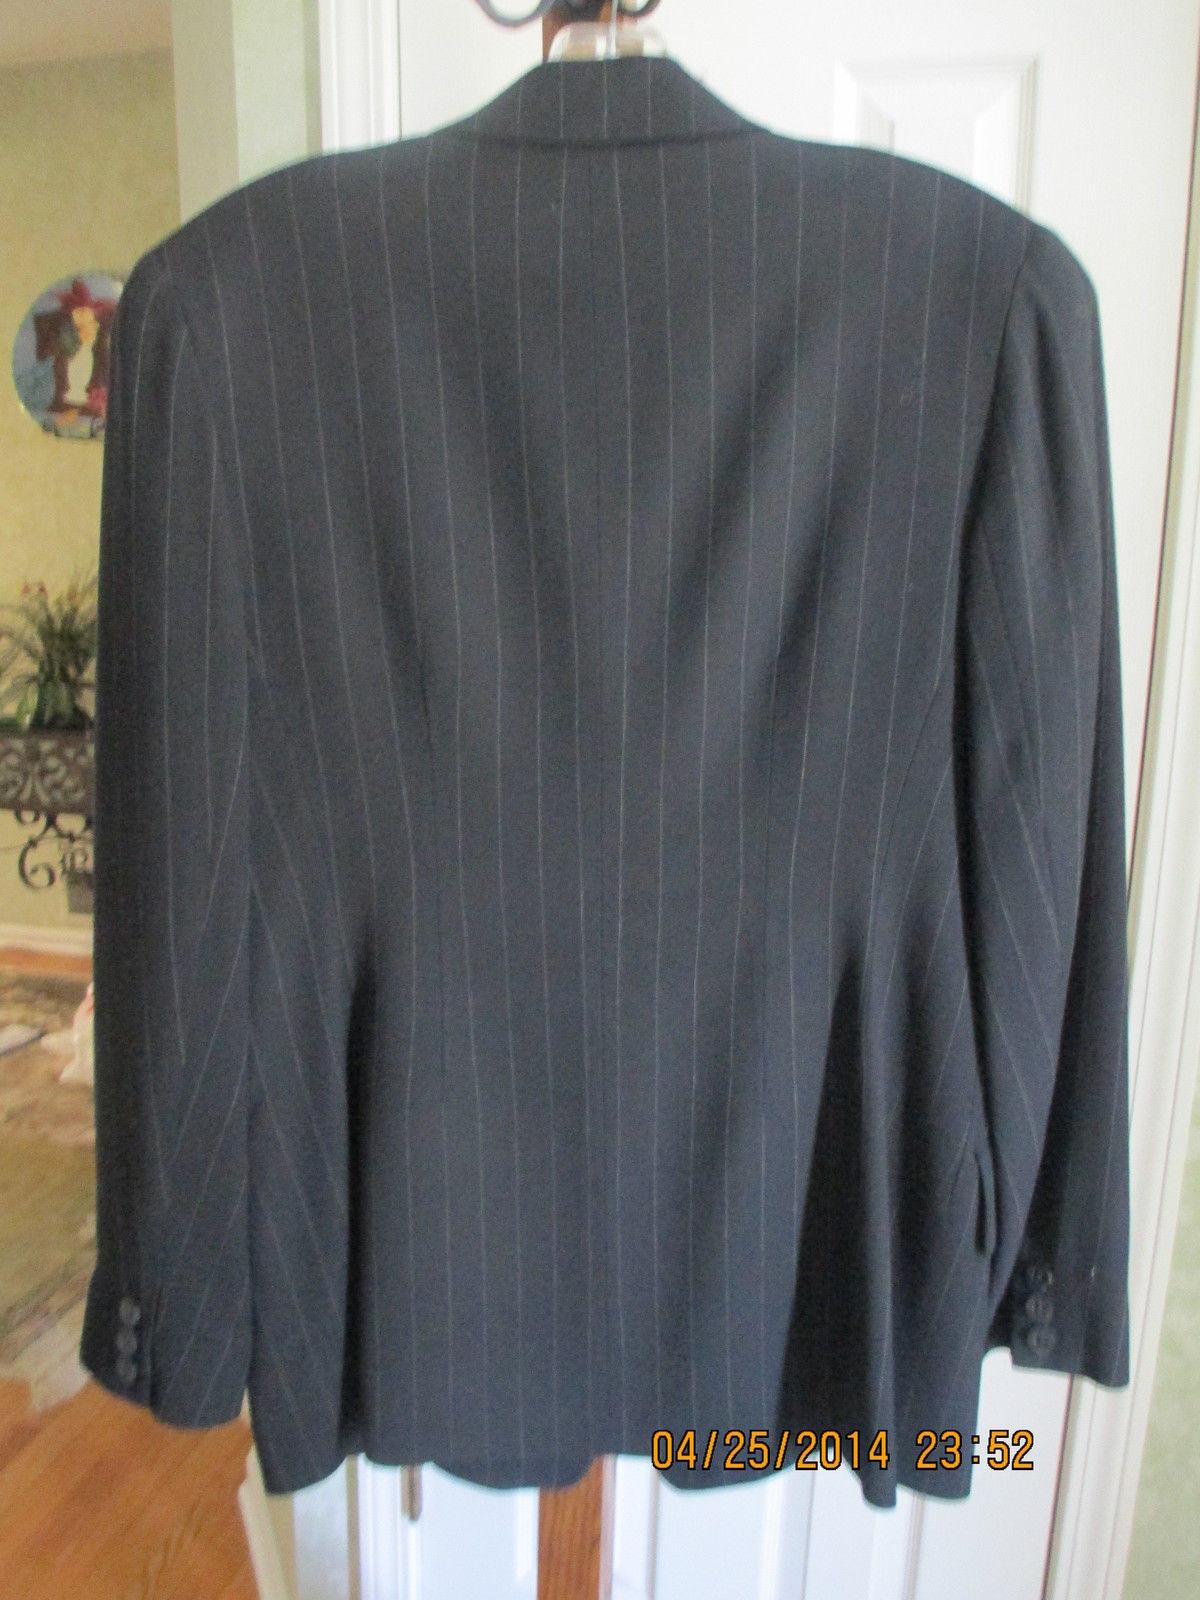 Emanuel Ungaro Black Pinstripe Classic Blazer size 4/38